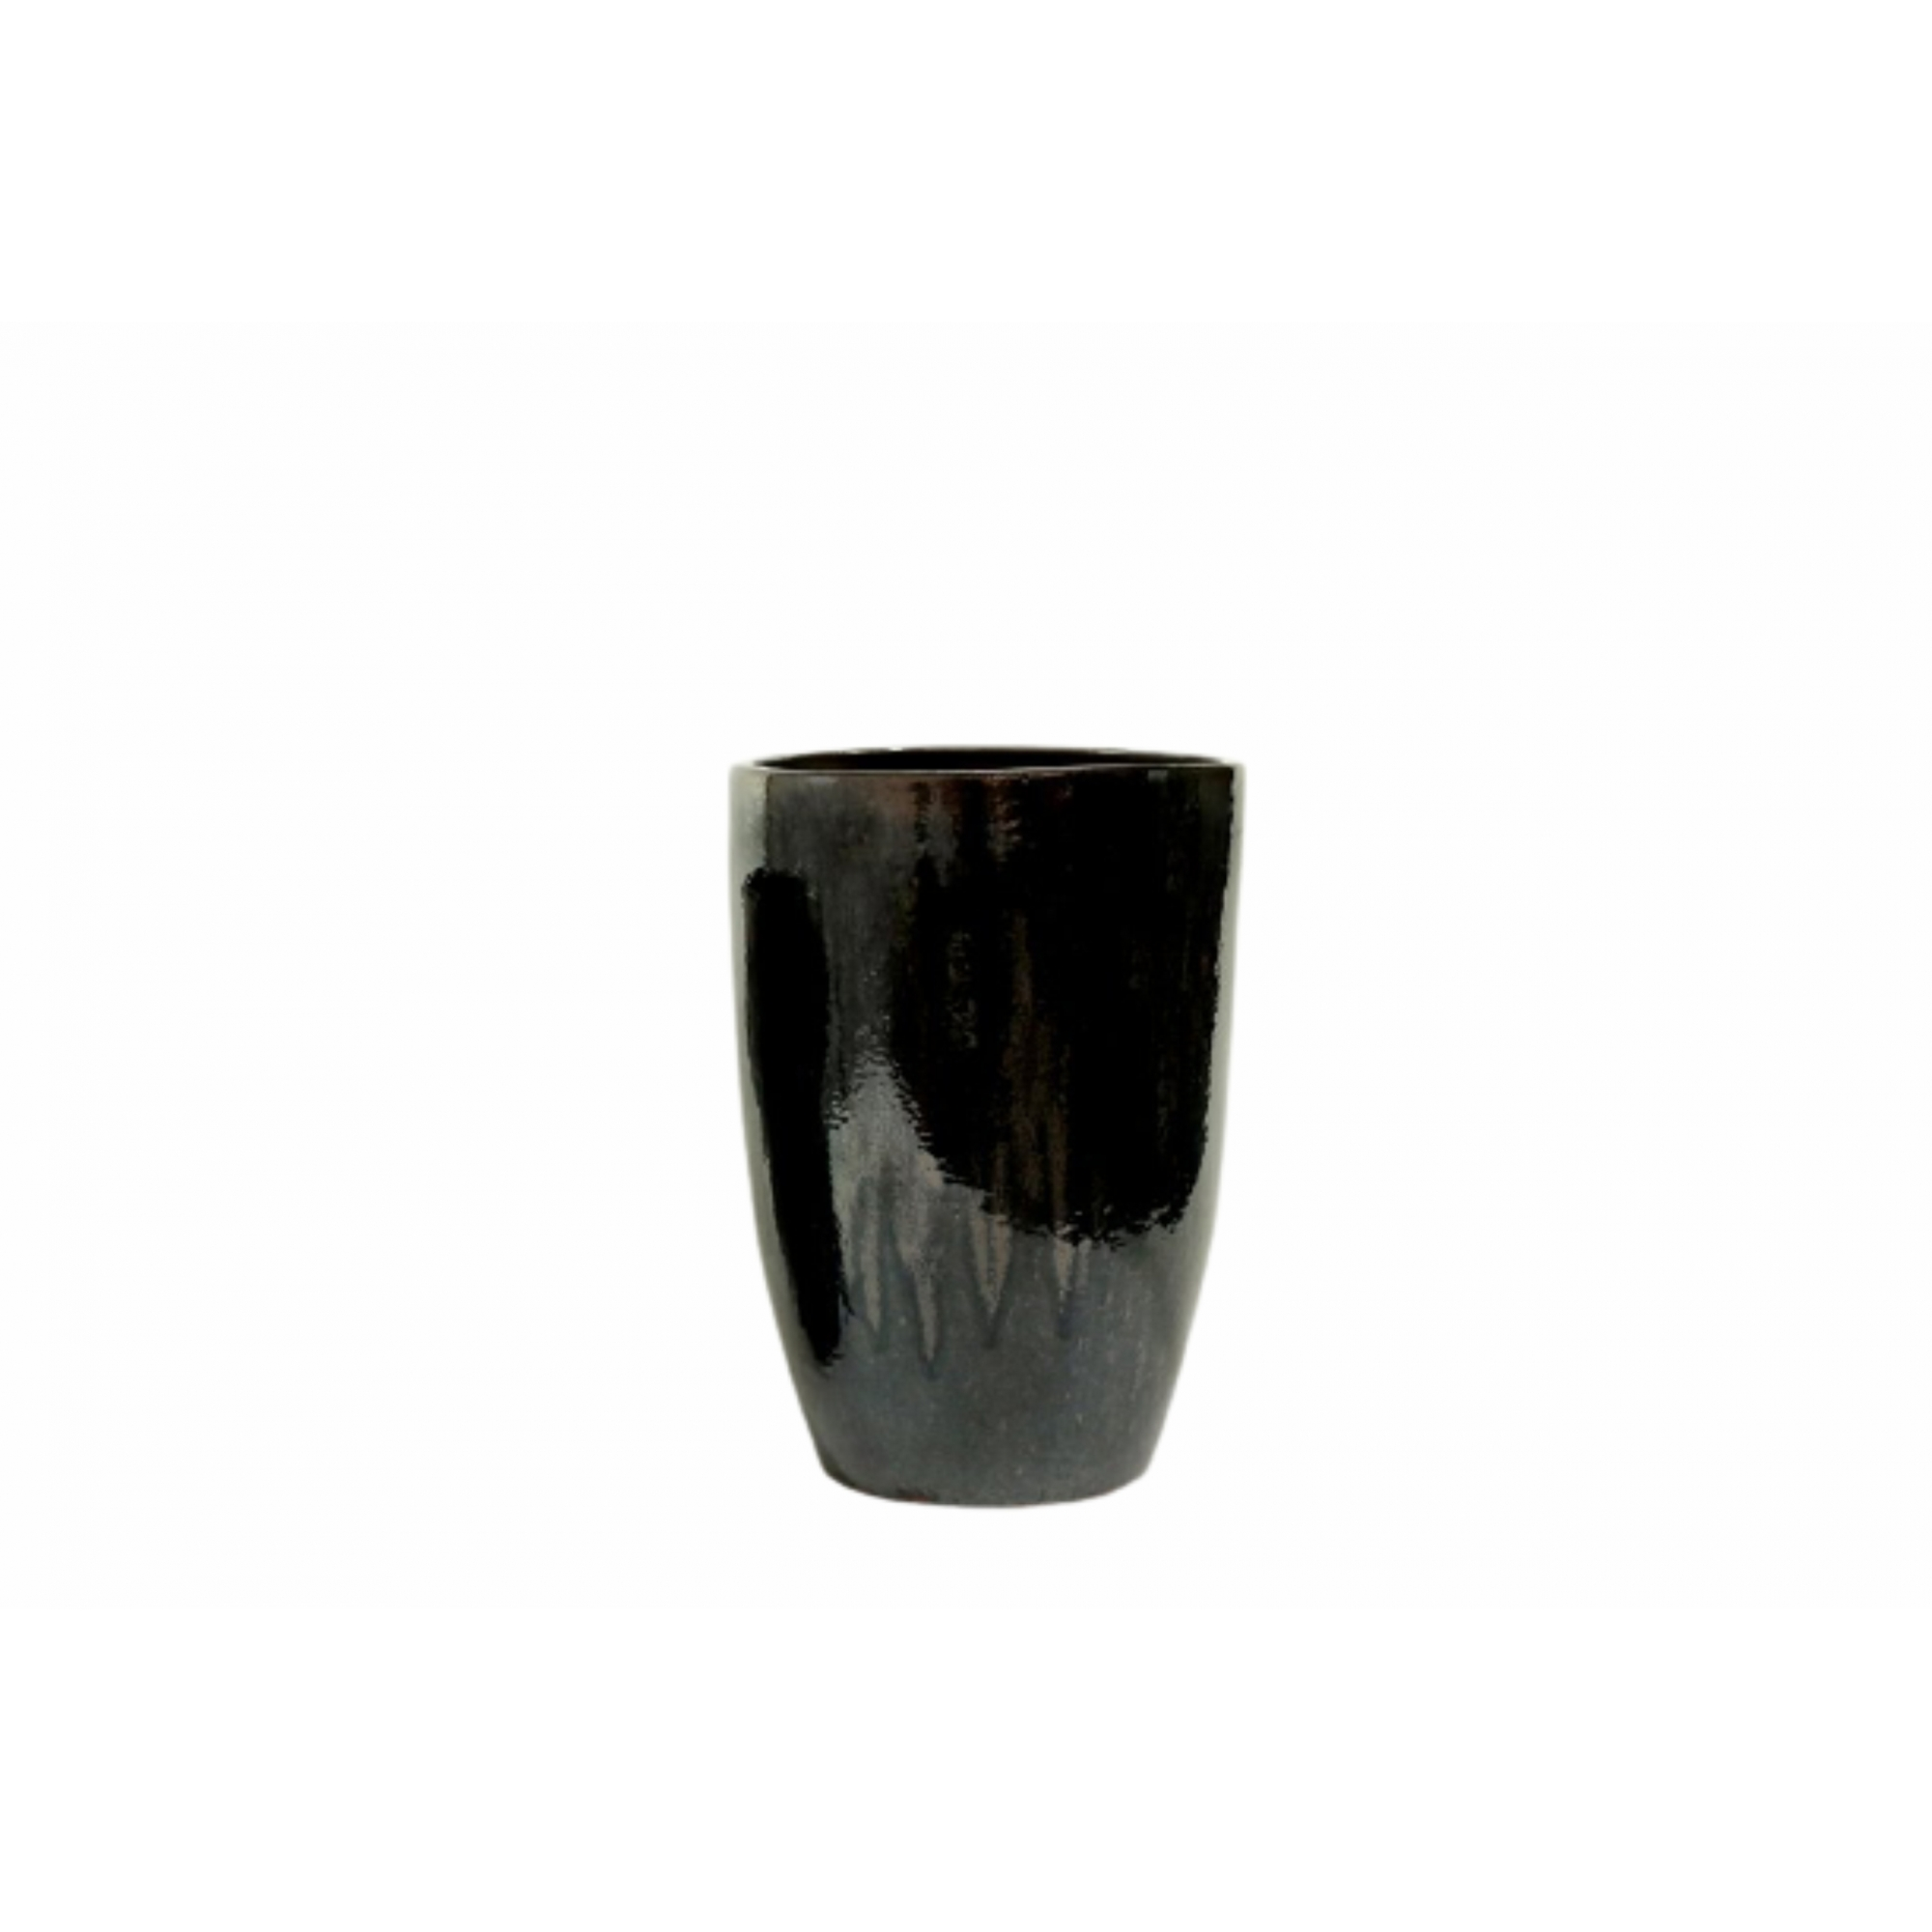 Vaso de Cerâmica Artesanal Chumbo Liv 35x51cm